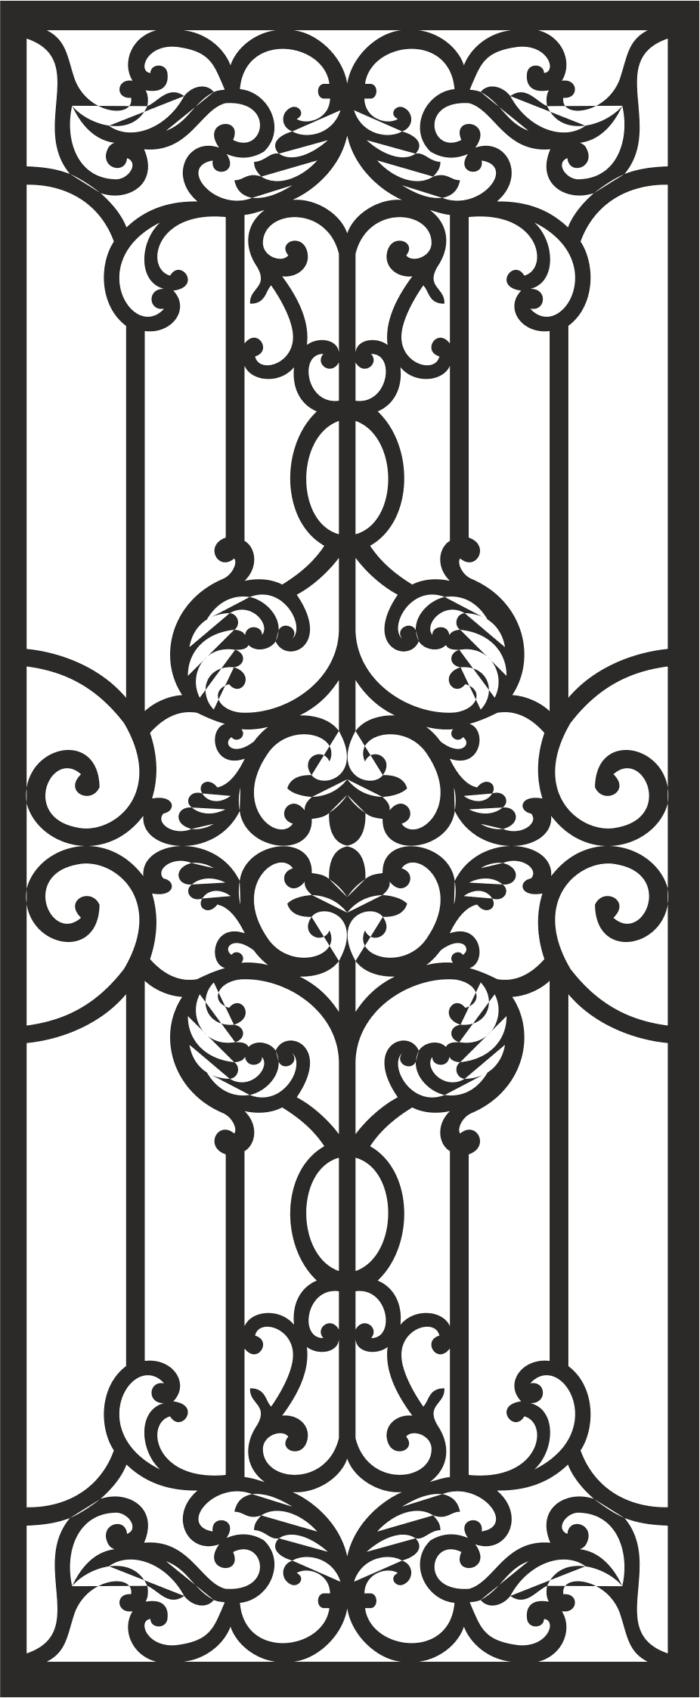 Home Iron Grills Design File Free CDR Vectors Art